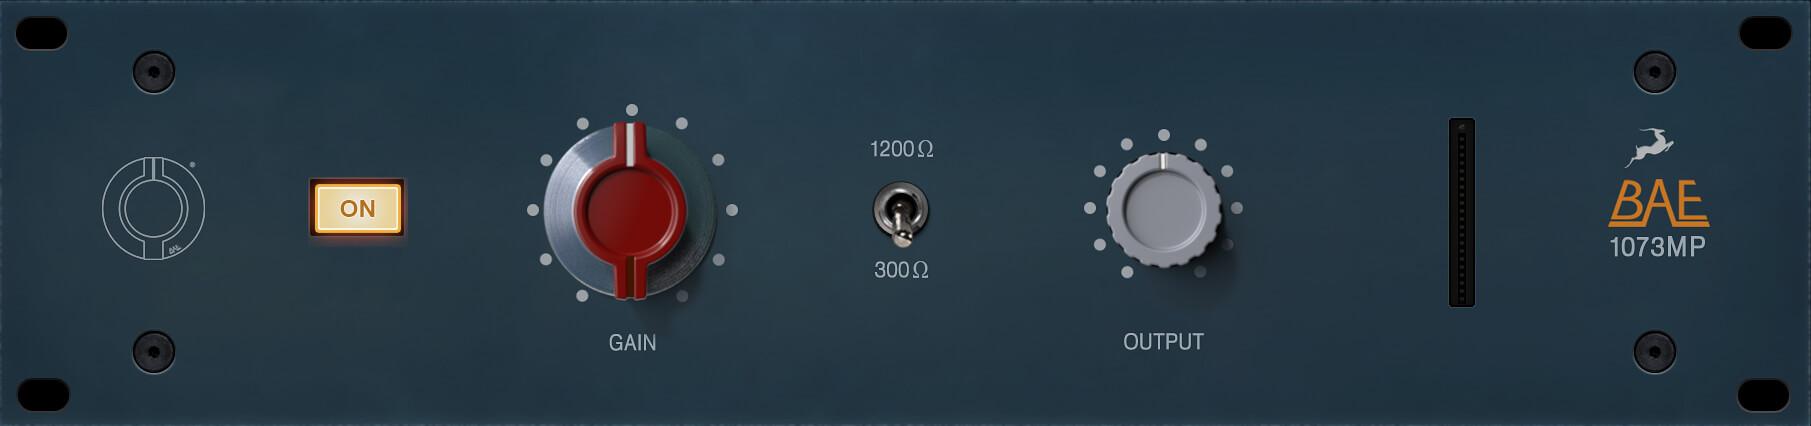 BAE1073MP